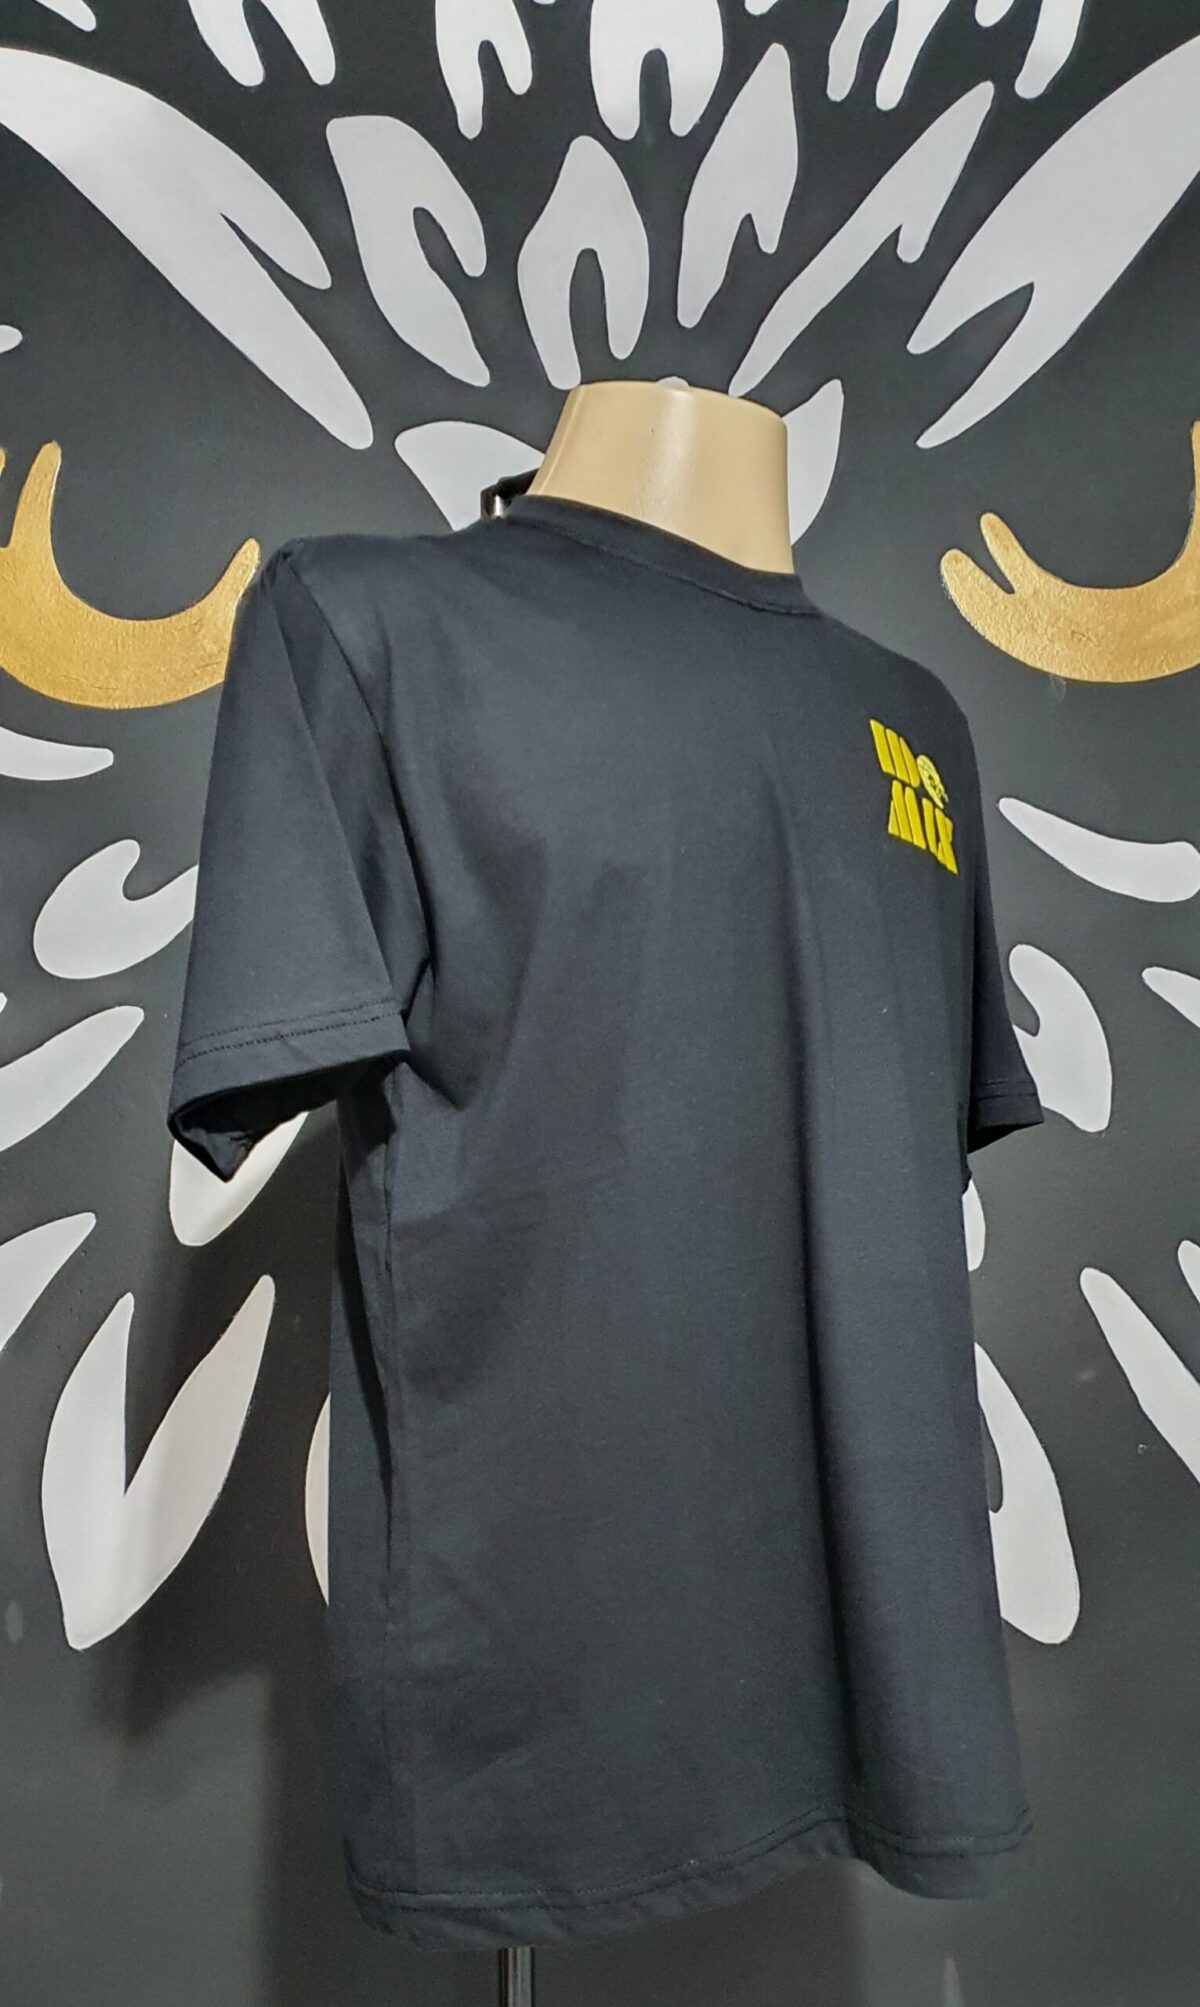 Camiseta Bordada DJ IDO MIX by Bordado & Cia - @bordado.cia @djidomix @canaldj